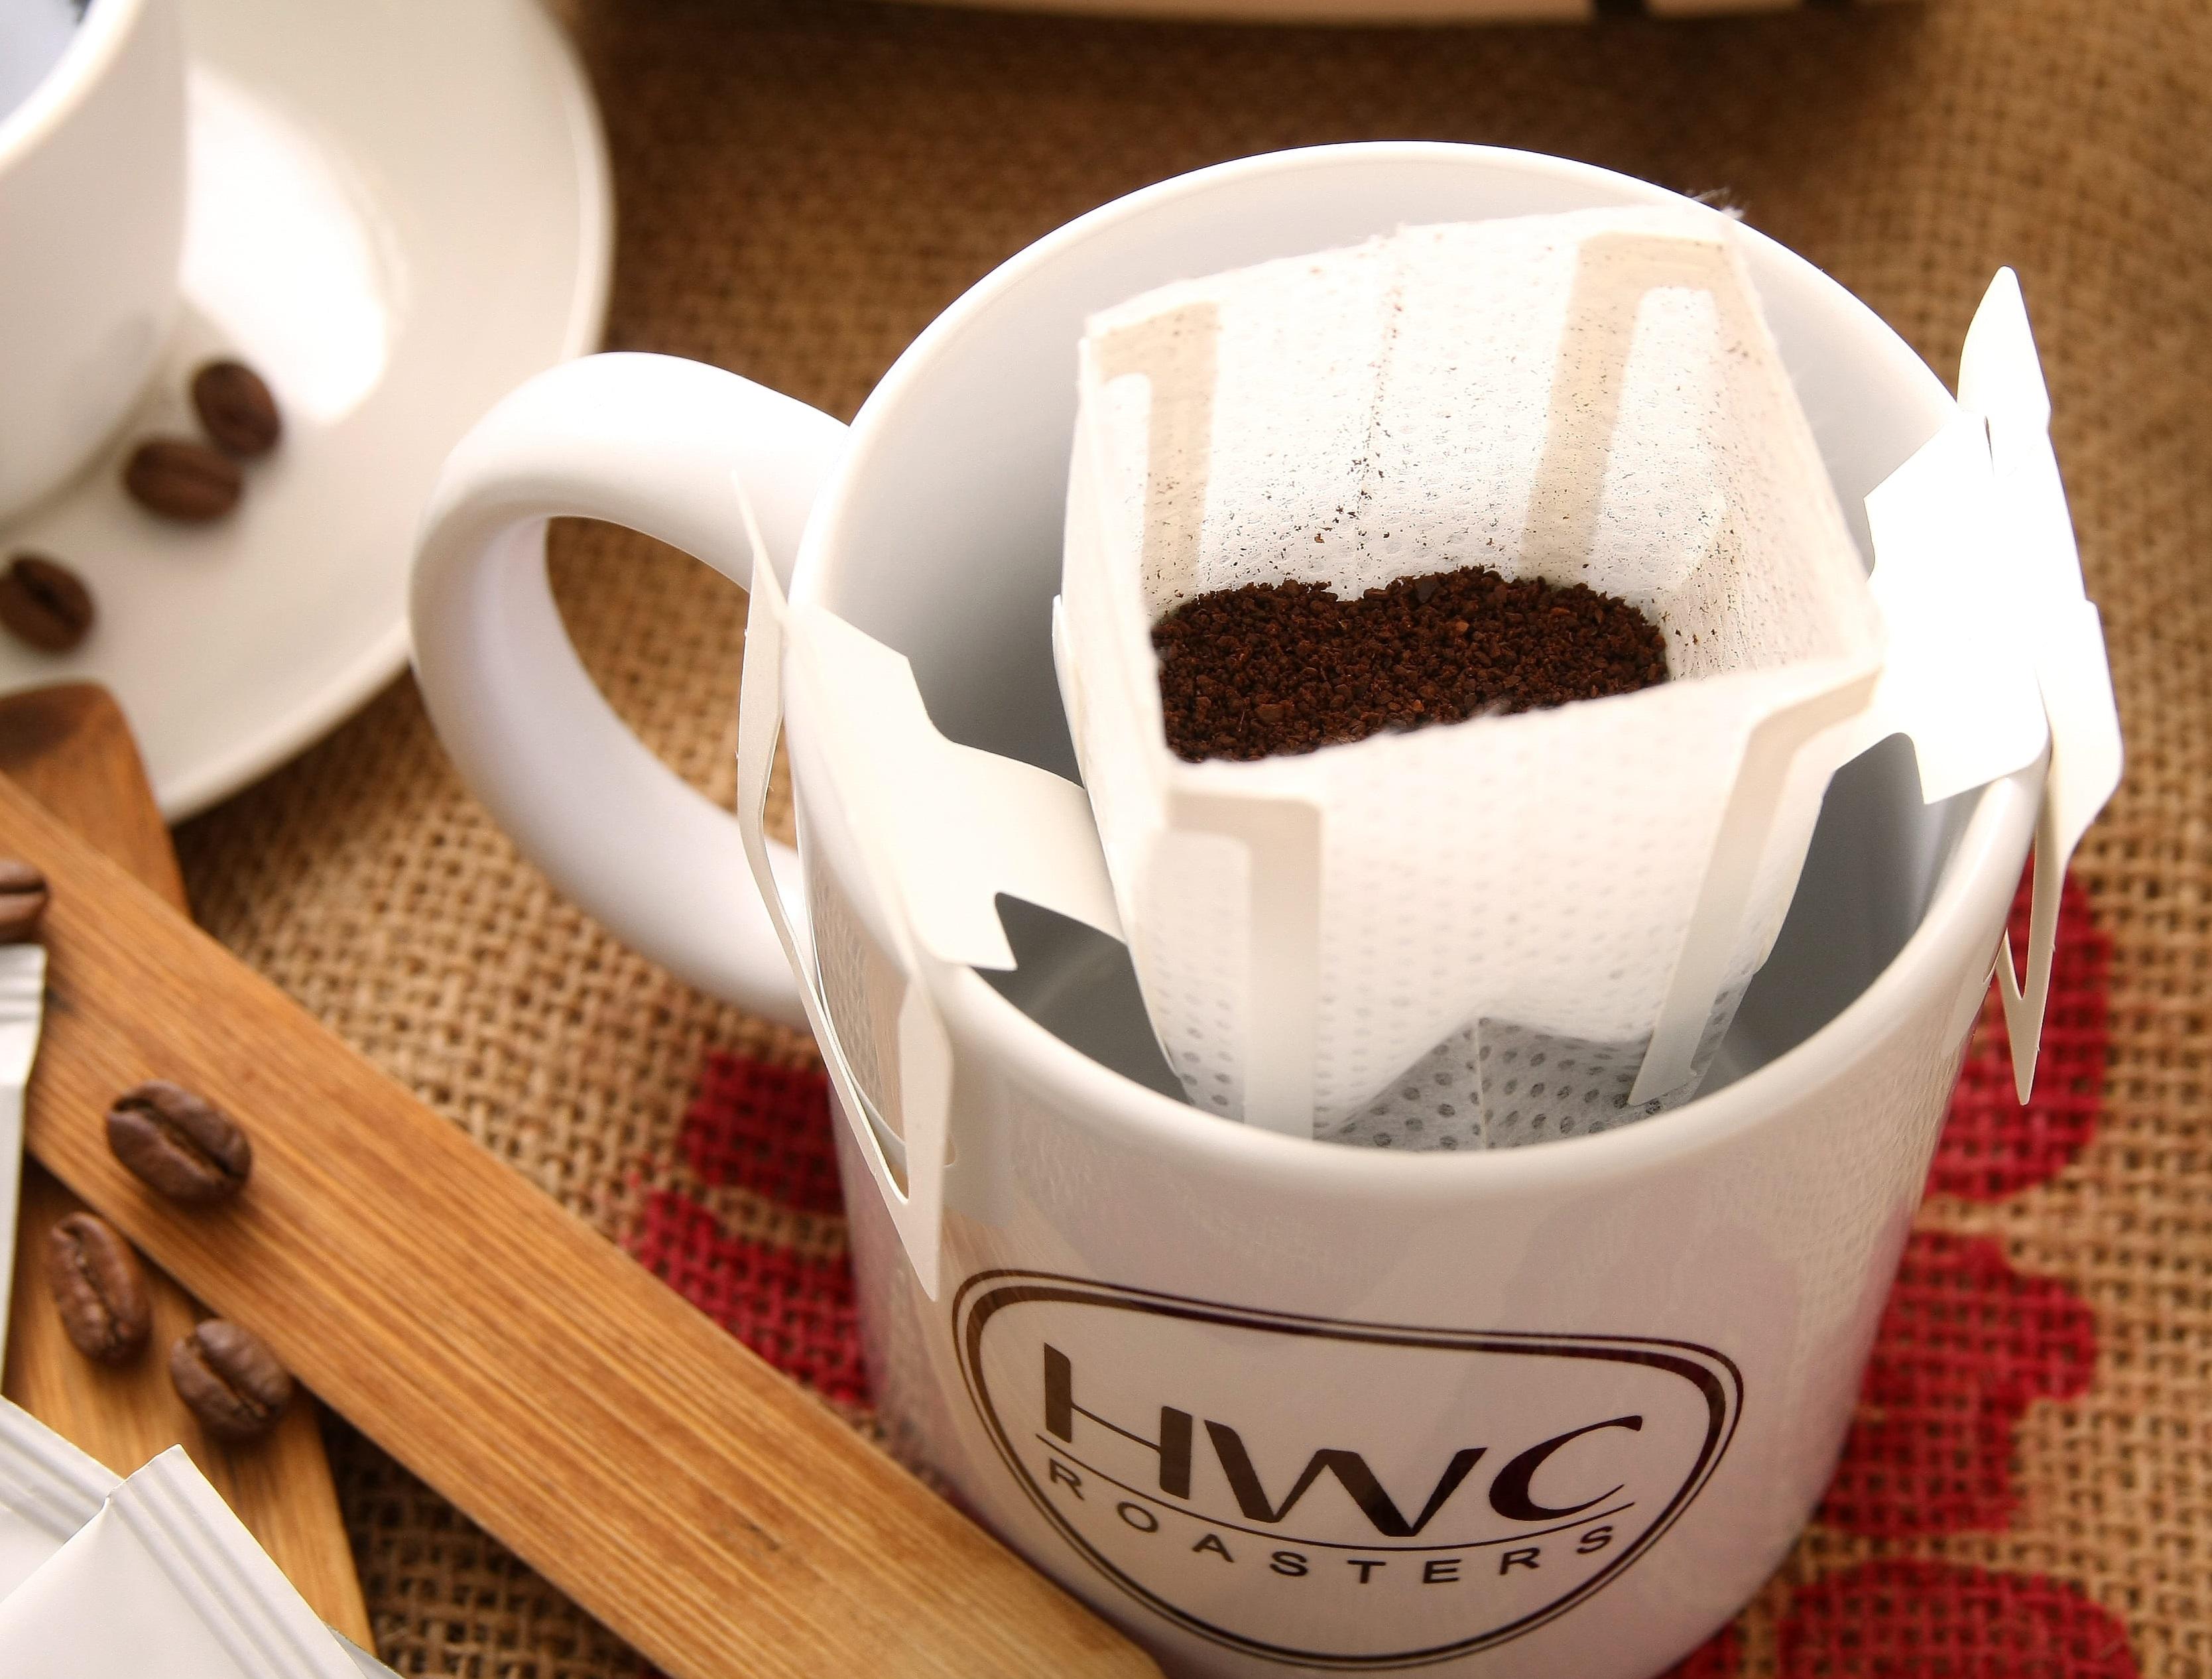 Ethiopia Gesha Village Geisha Natural Ground Coffee Drip Coffee OEM ODM Private Label Wholesale